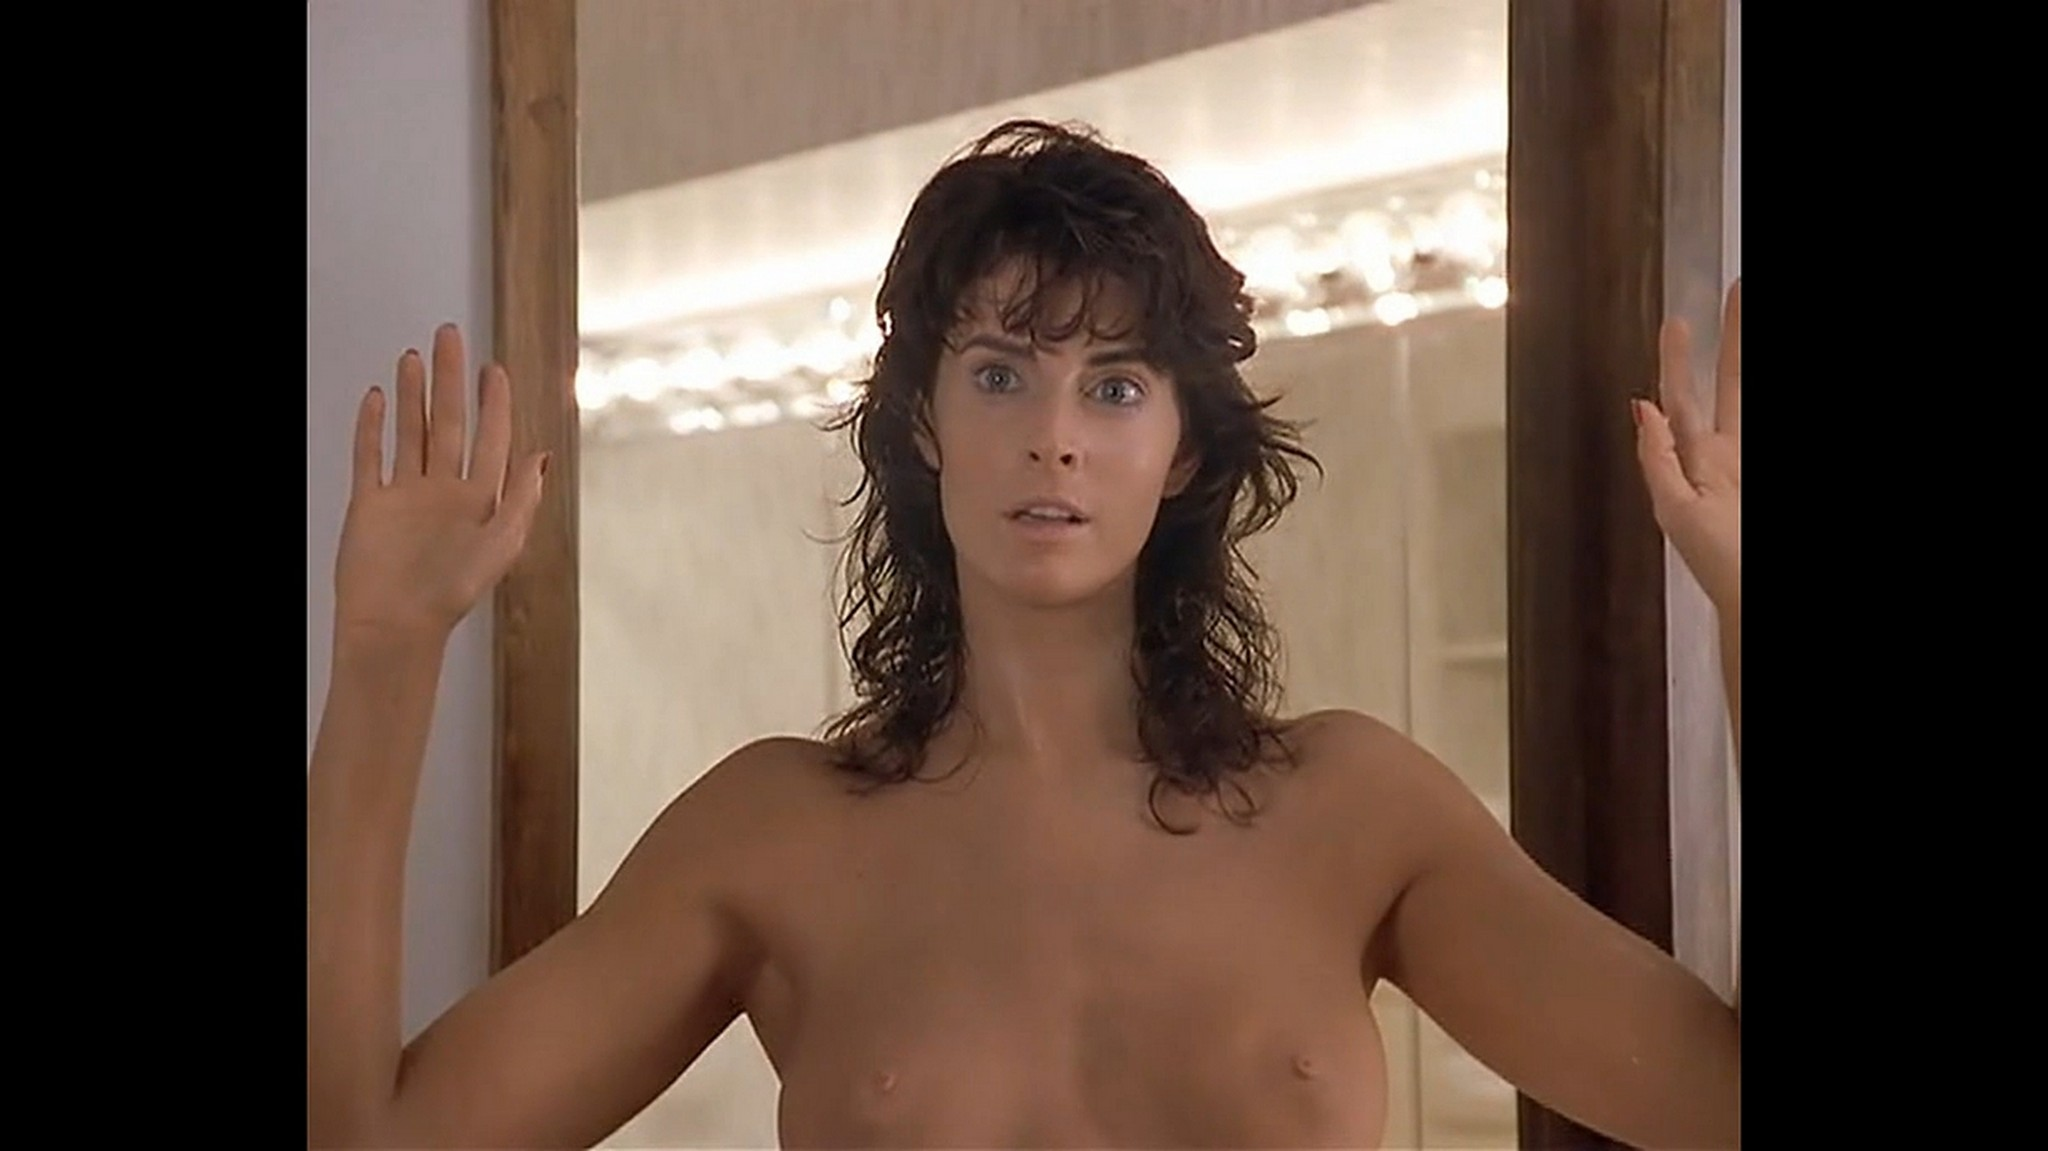 Joan Severance nude topless - See No Evil Hear No Evil (1989) HD 720/1080p (15)